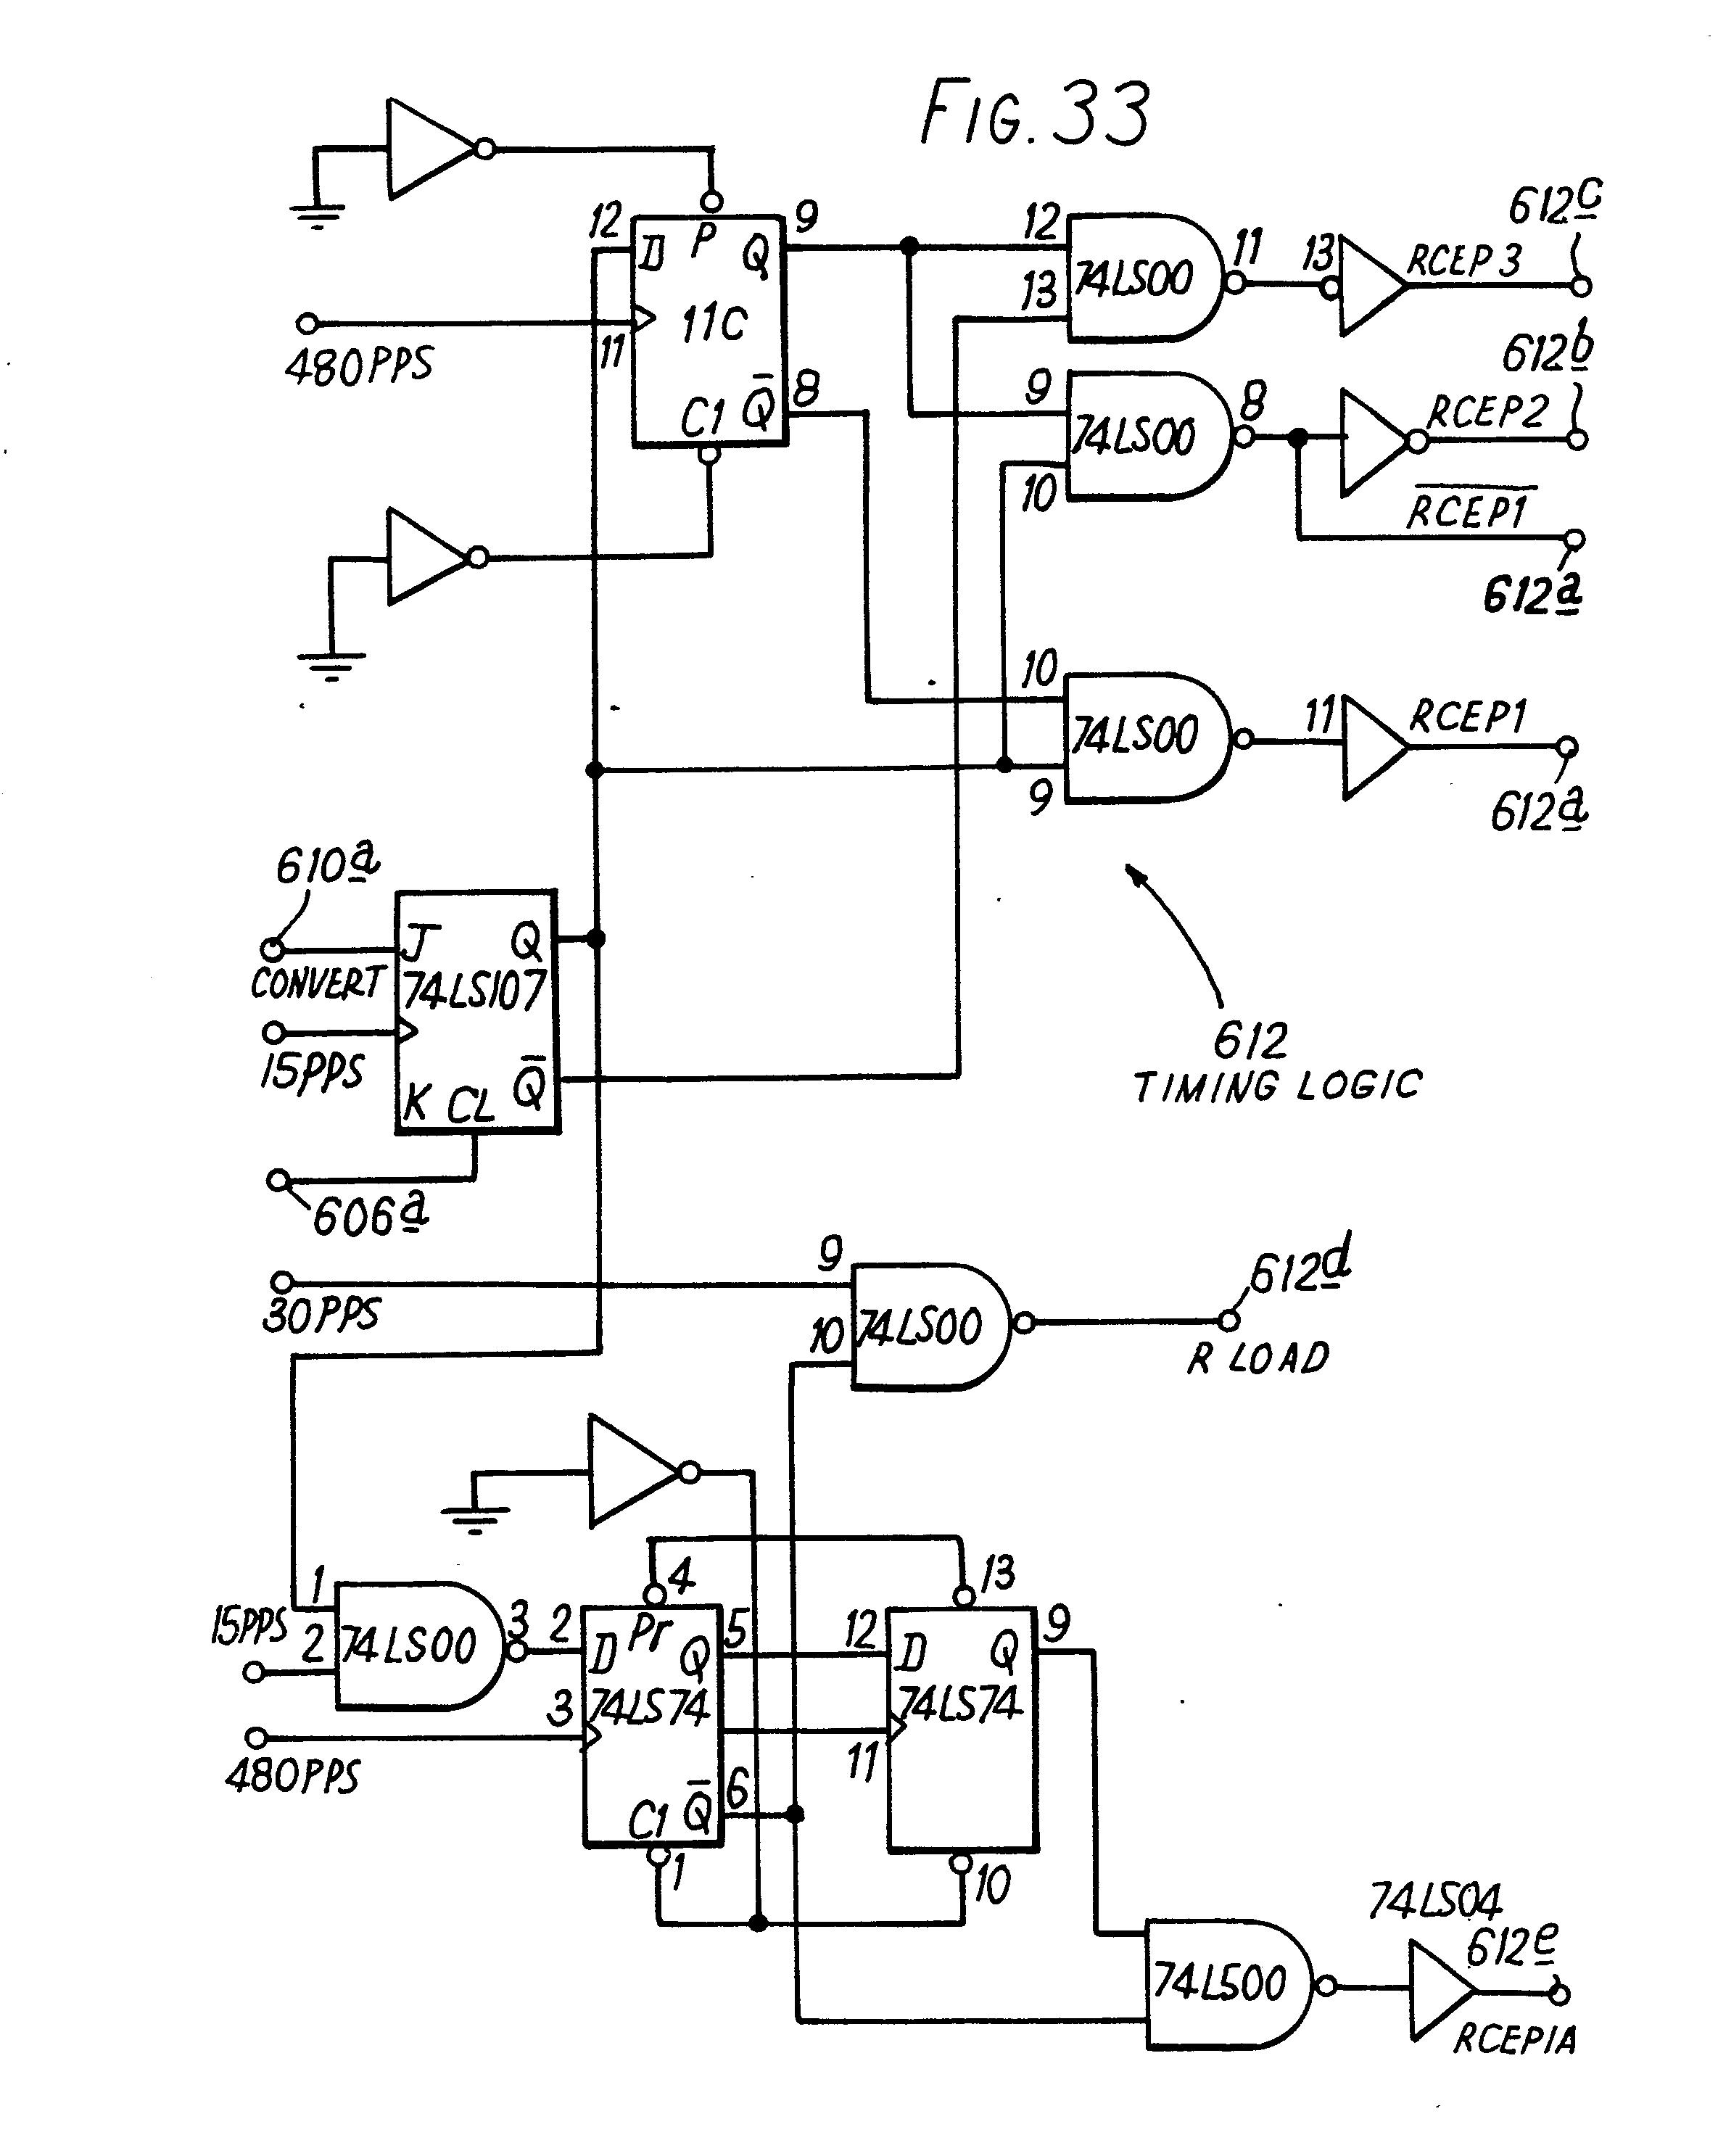 patent ep0012530a1 apnea monitor google patents on digital comparator schematic